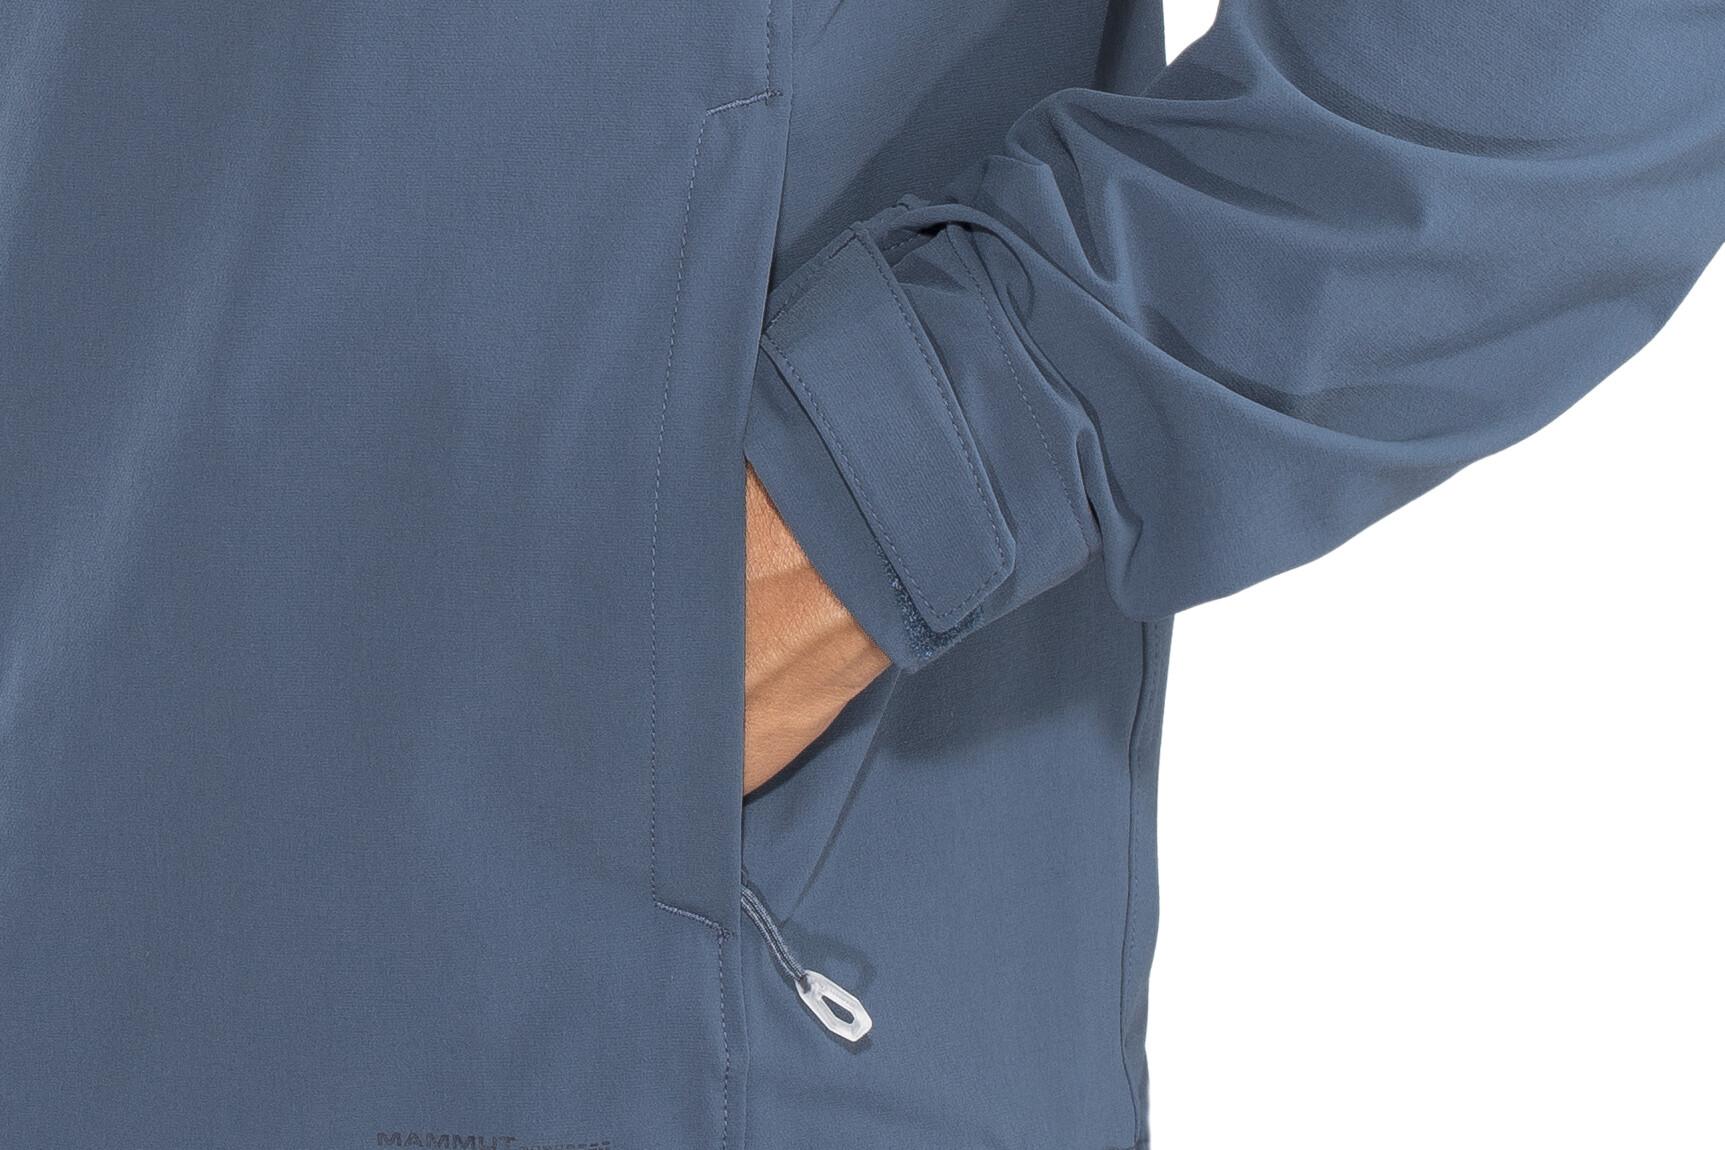 Mammut Klettergurt Jay : Mammut runbold trail so hooded jacket men jay campz